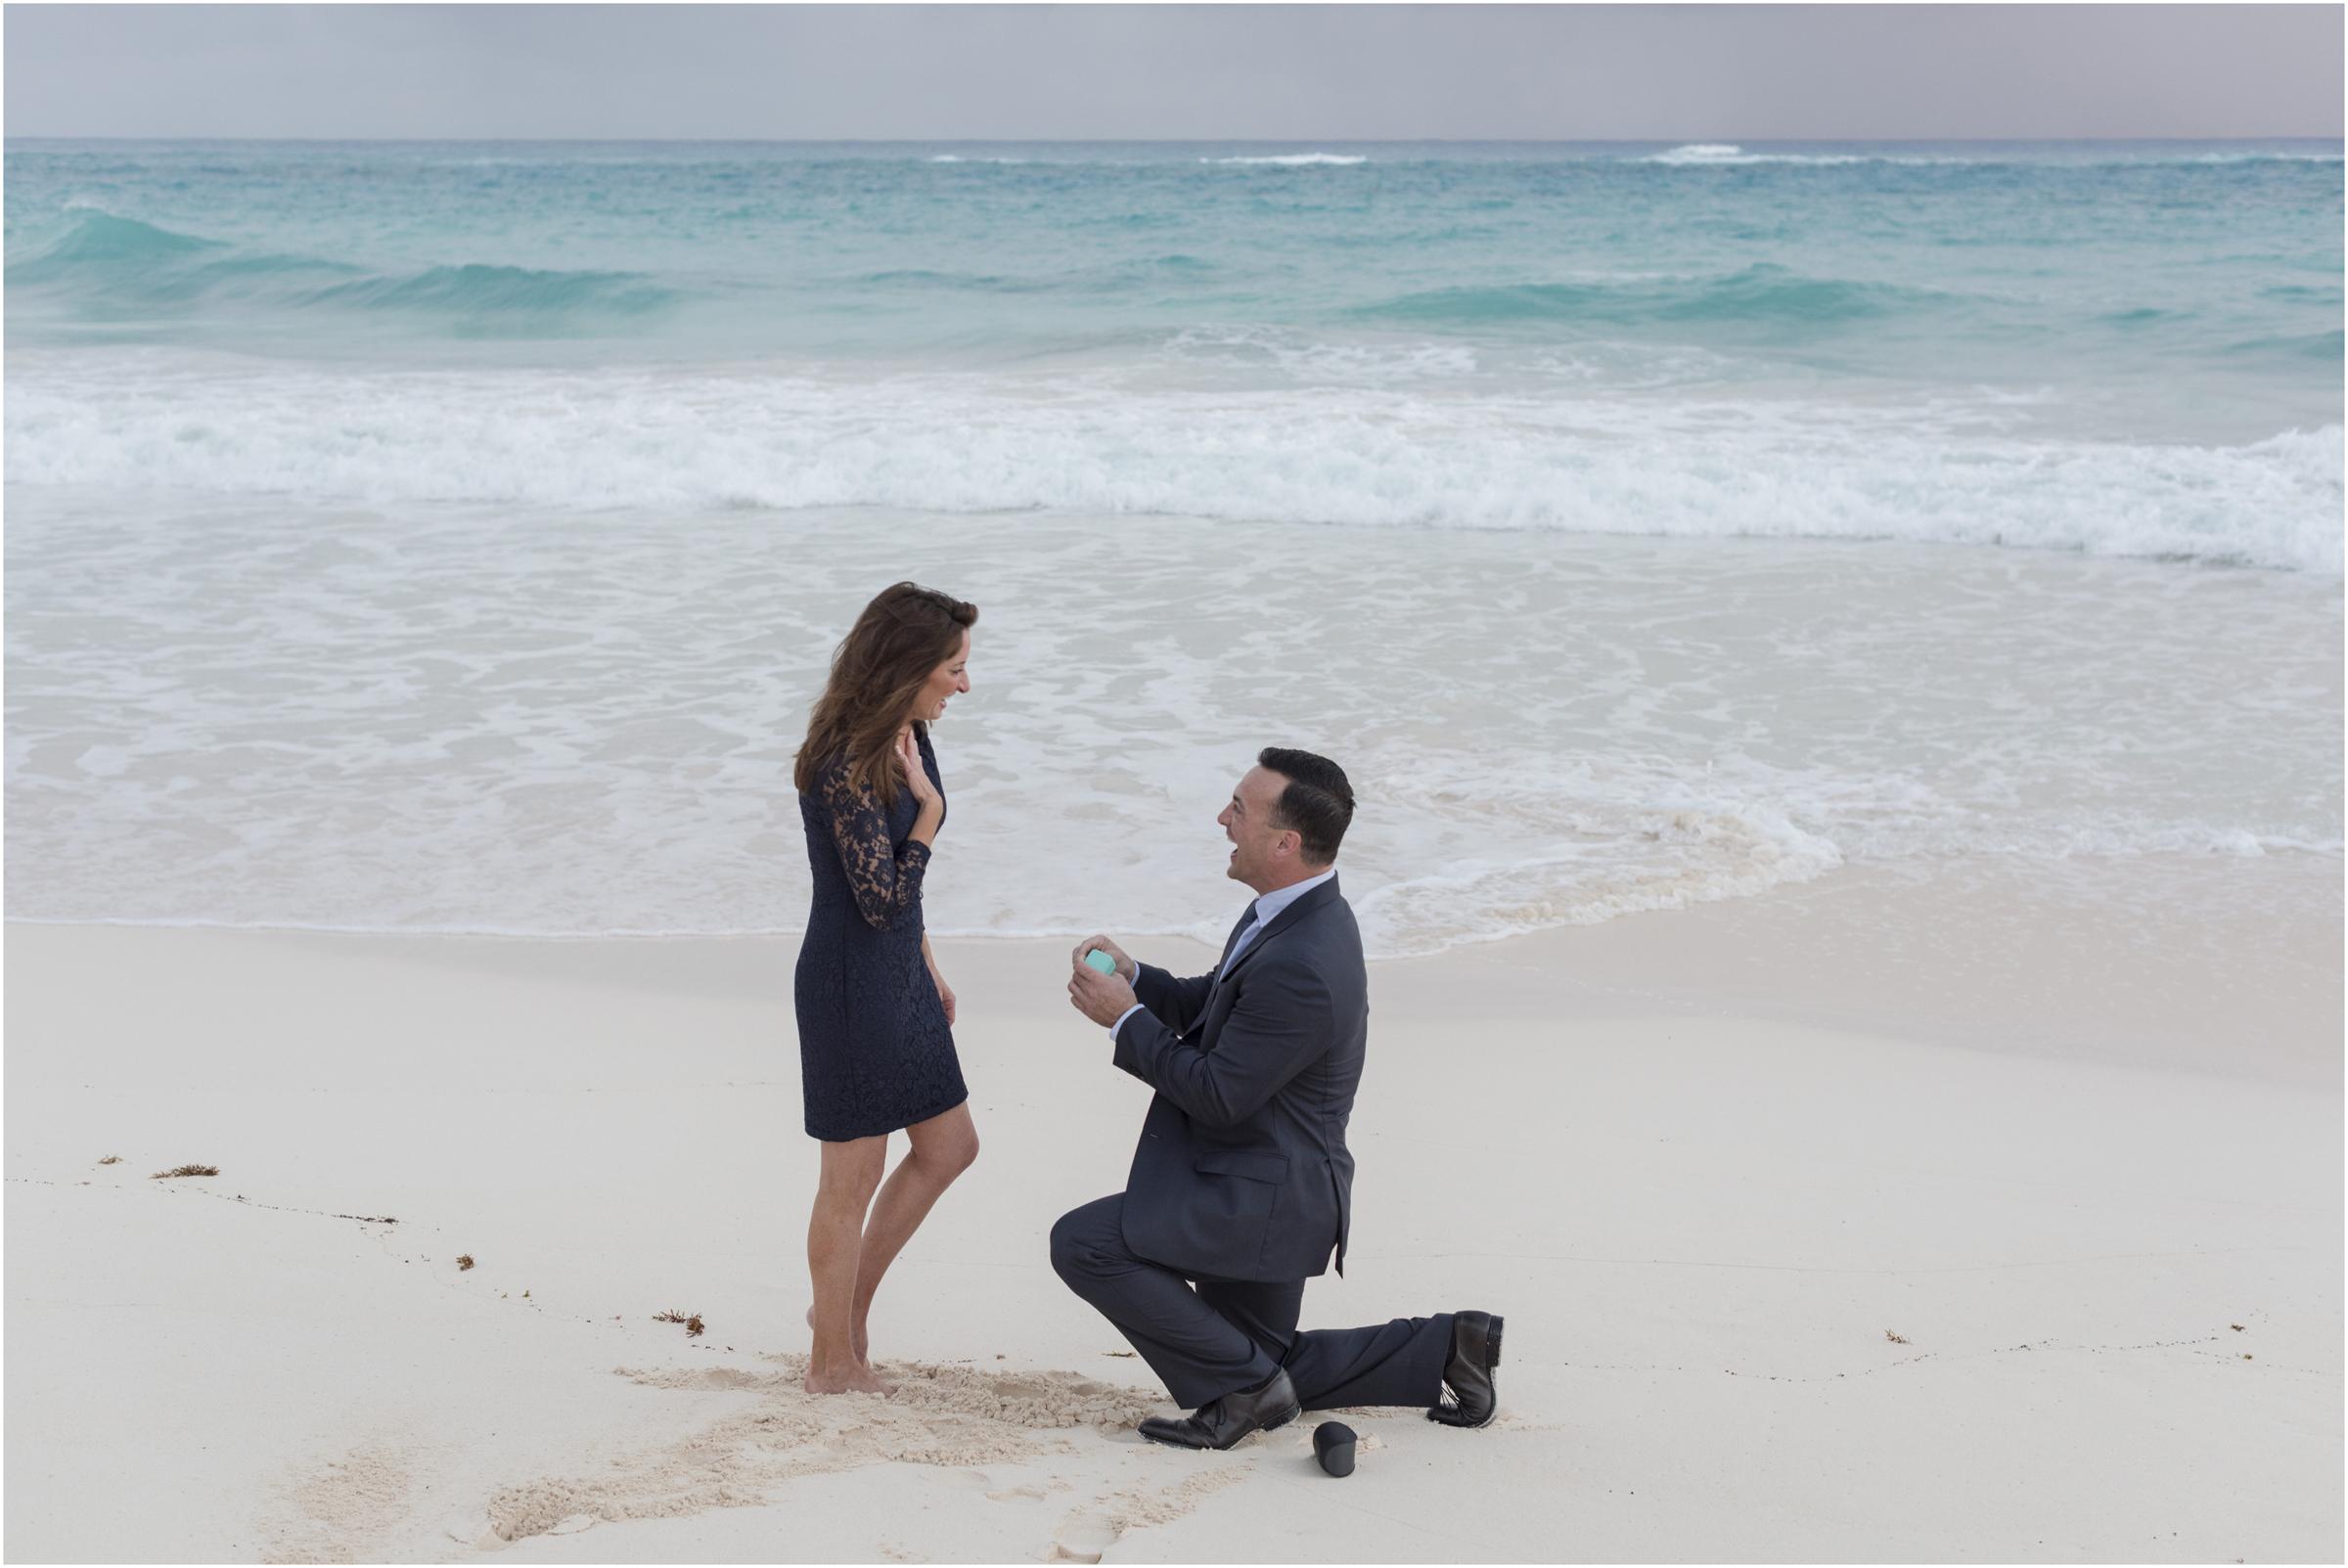 ©FianderFoto_Engagement_Doug_Mary_4.jpg